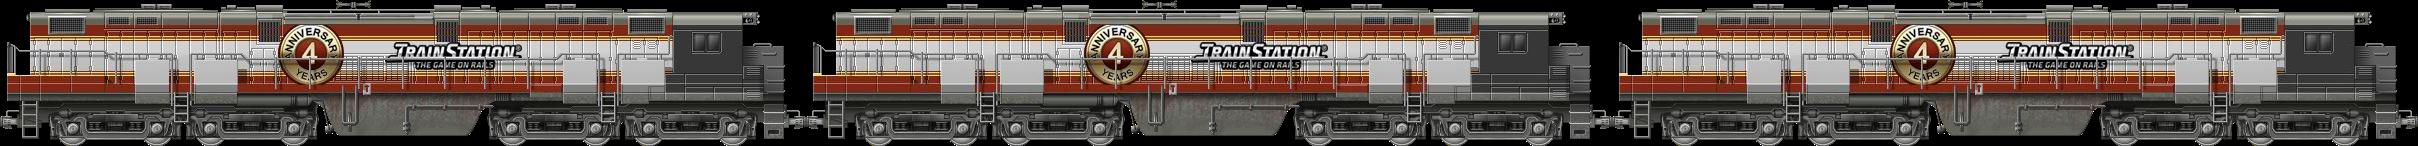 4th C-855 Triple